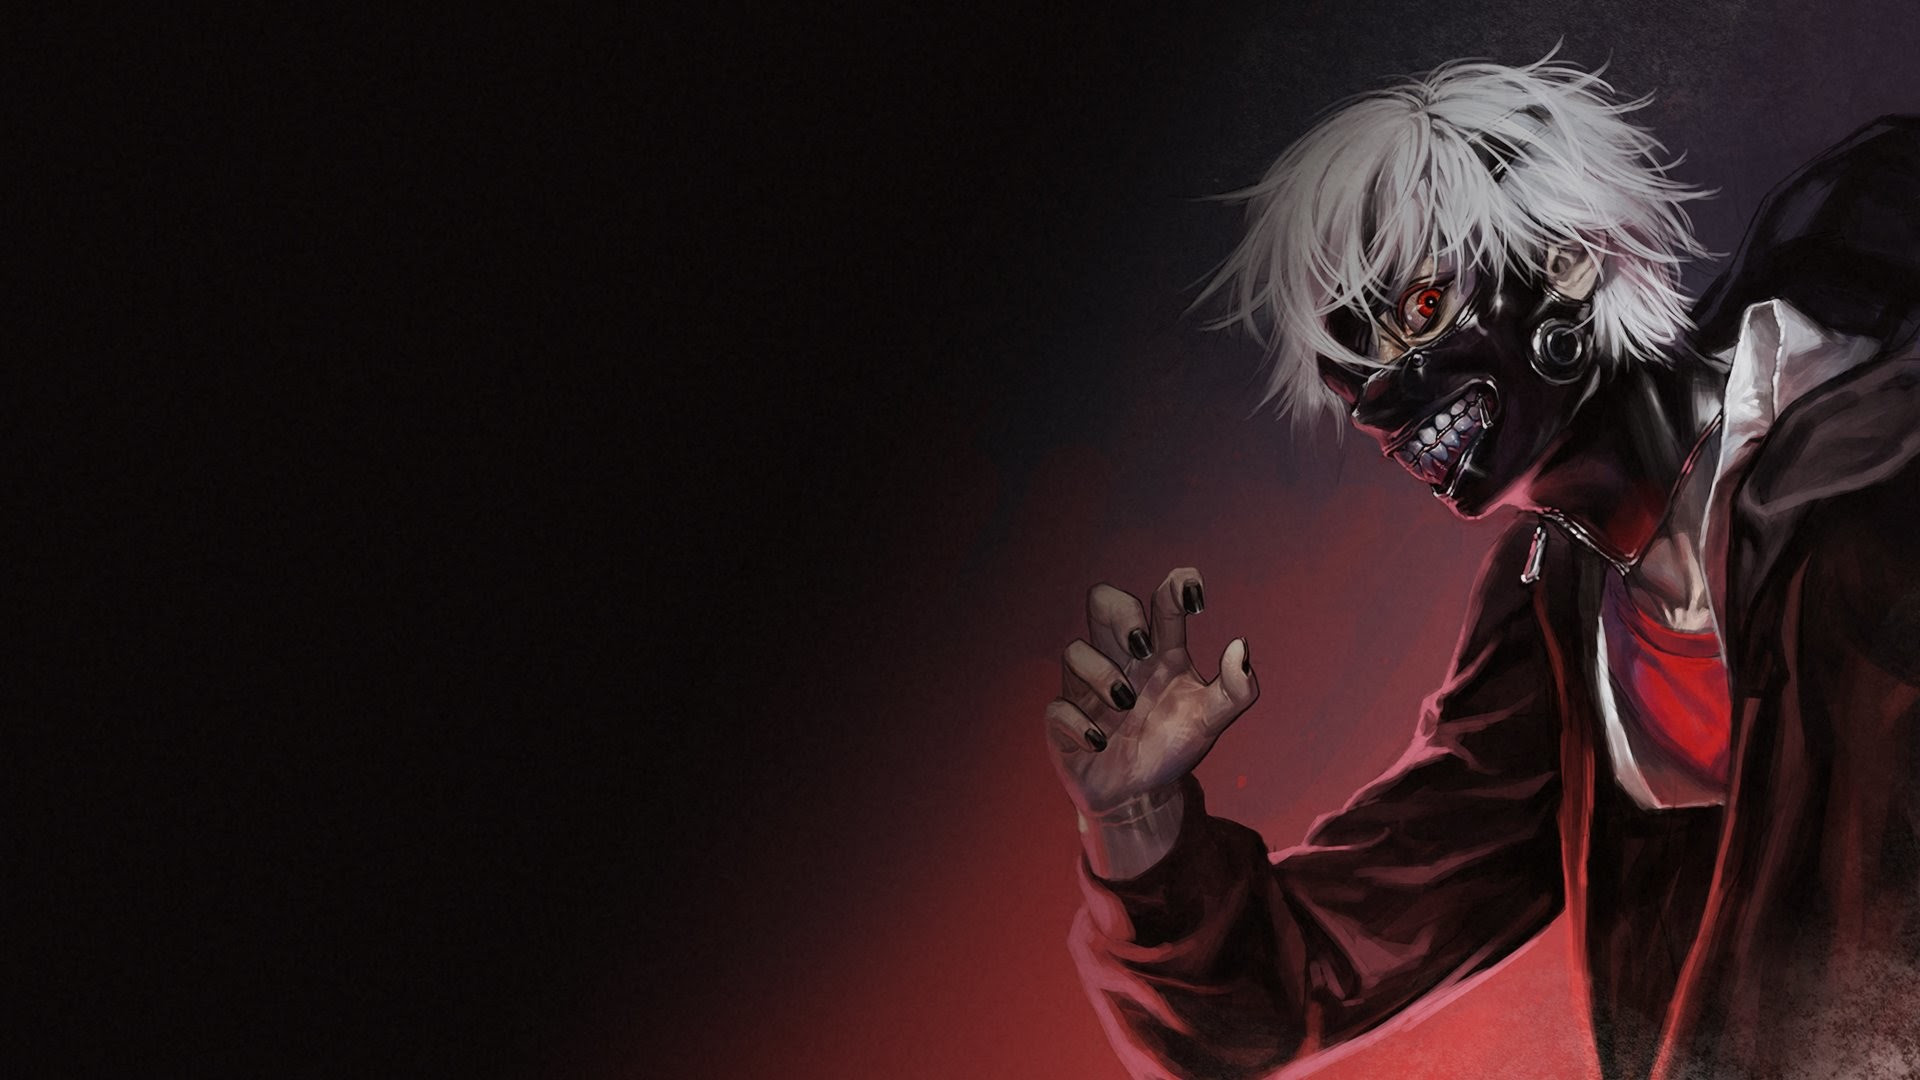 Wallpaper Horror Anime Background Gambarku